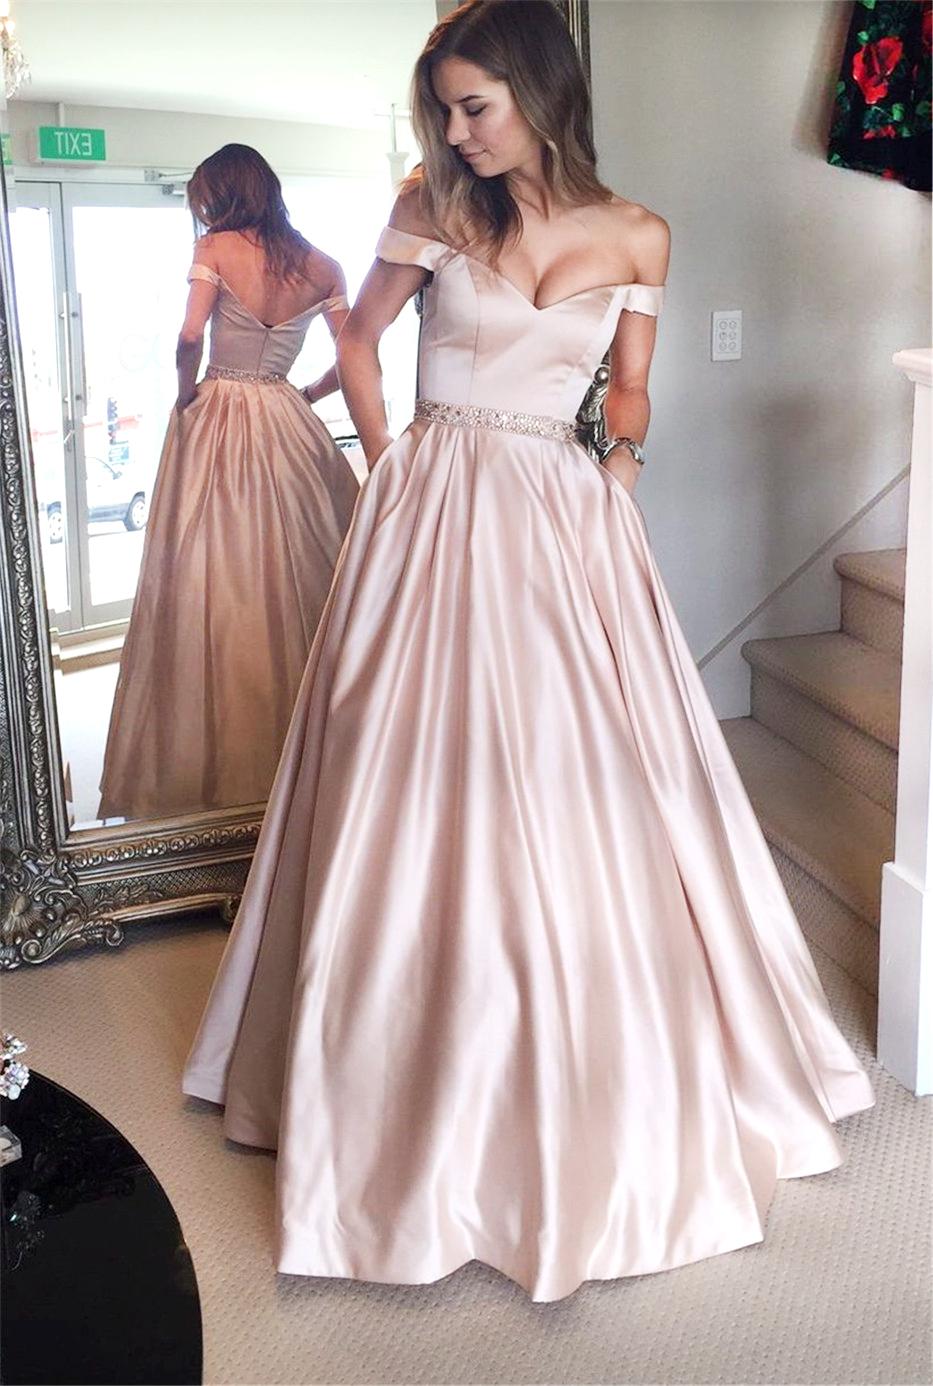 Stylish light pink off shoulder long prom dresslight pink evening dresses  Dream Prom  Online